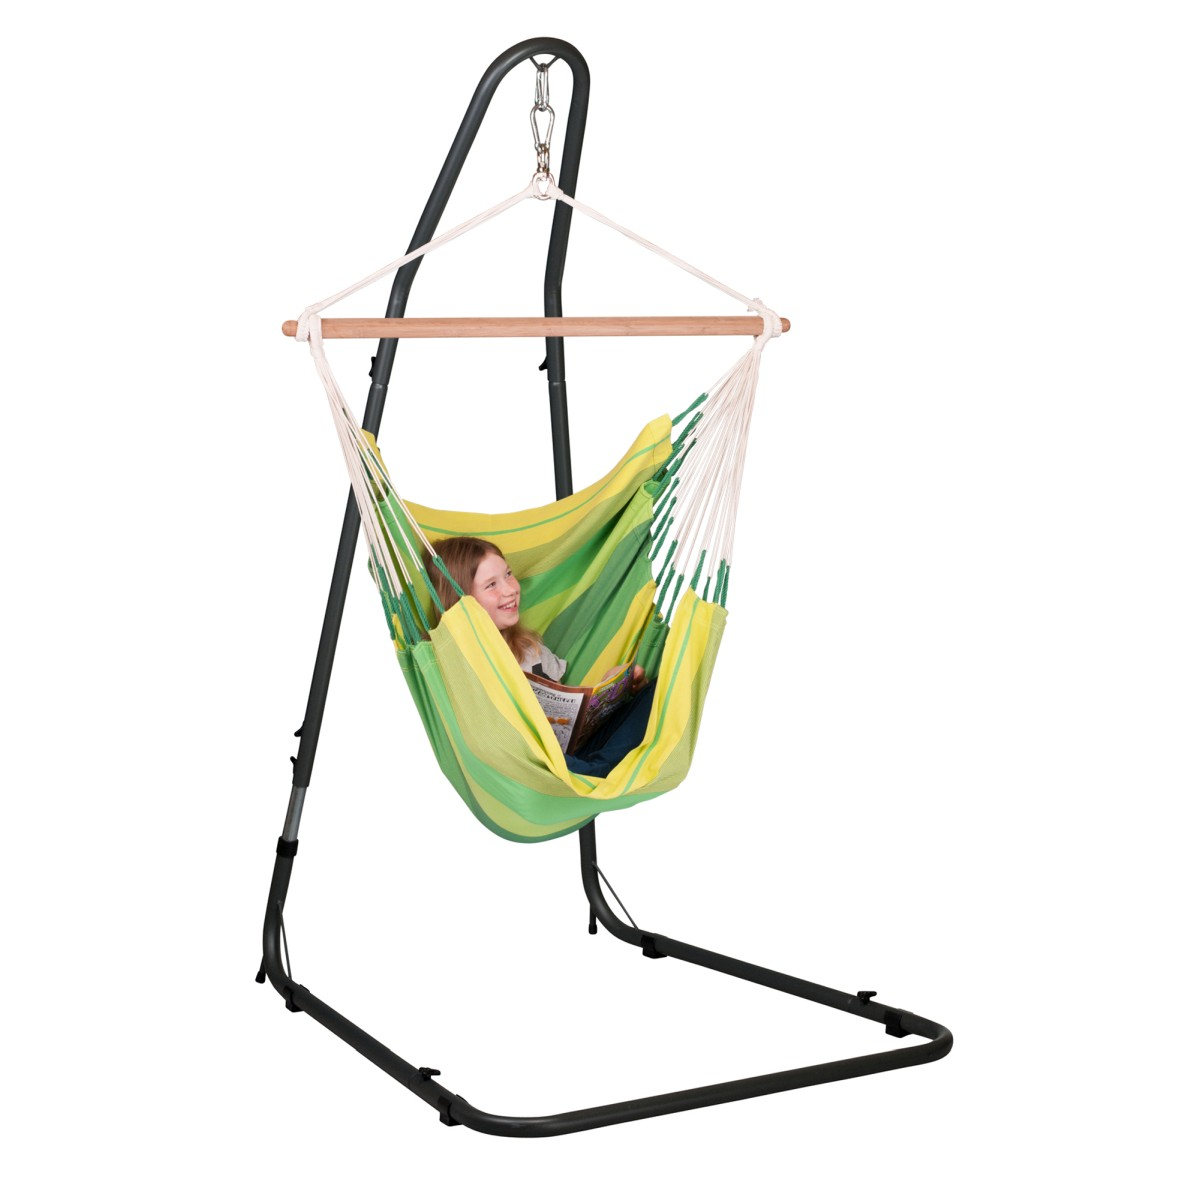 la siesta chaise hamac basic orquidea jungle support mediterr neo. Black Bedroom Furniture Sets. Home Design Ideas